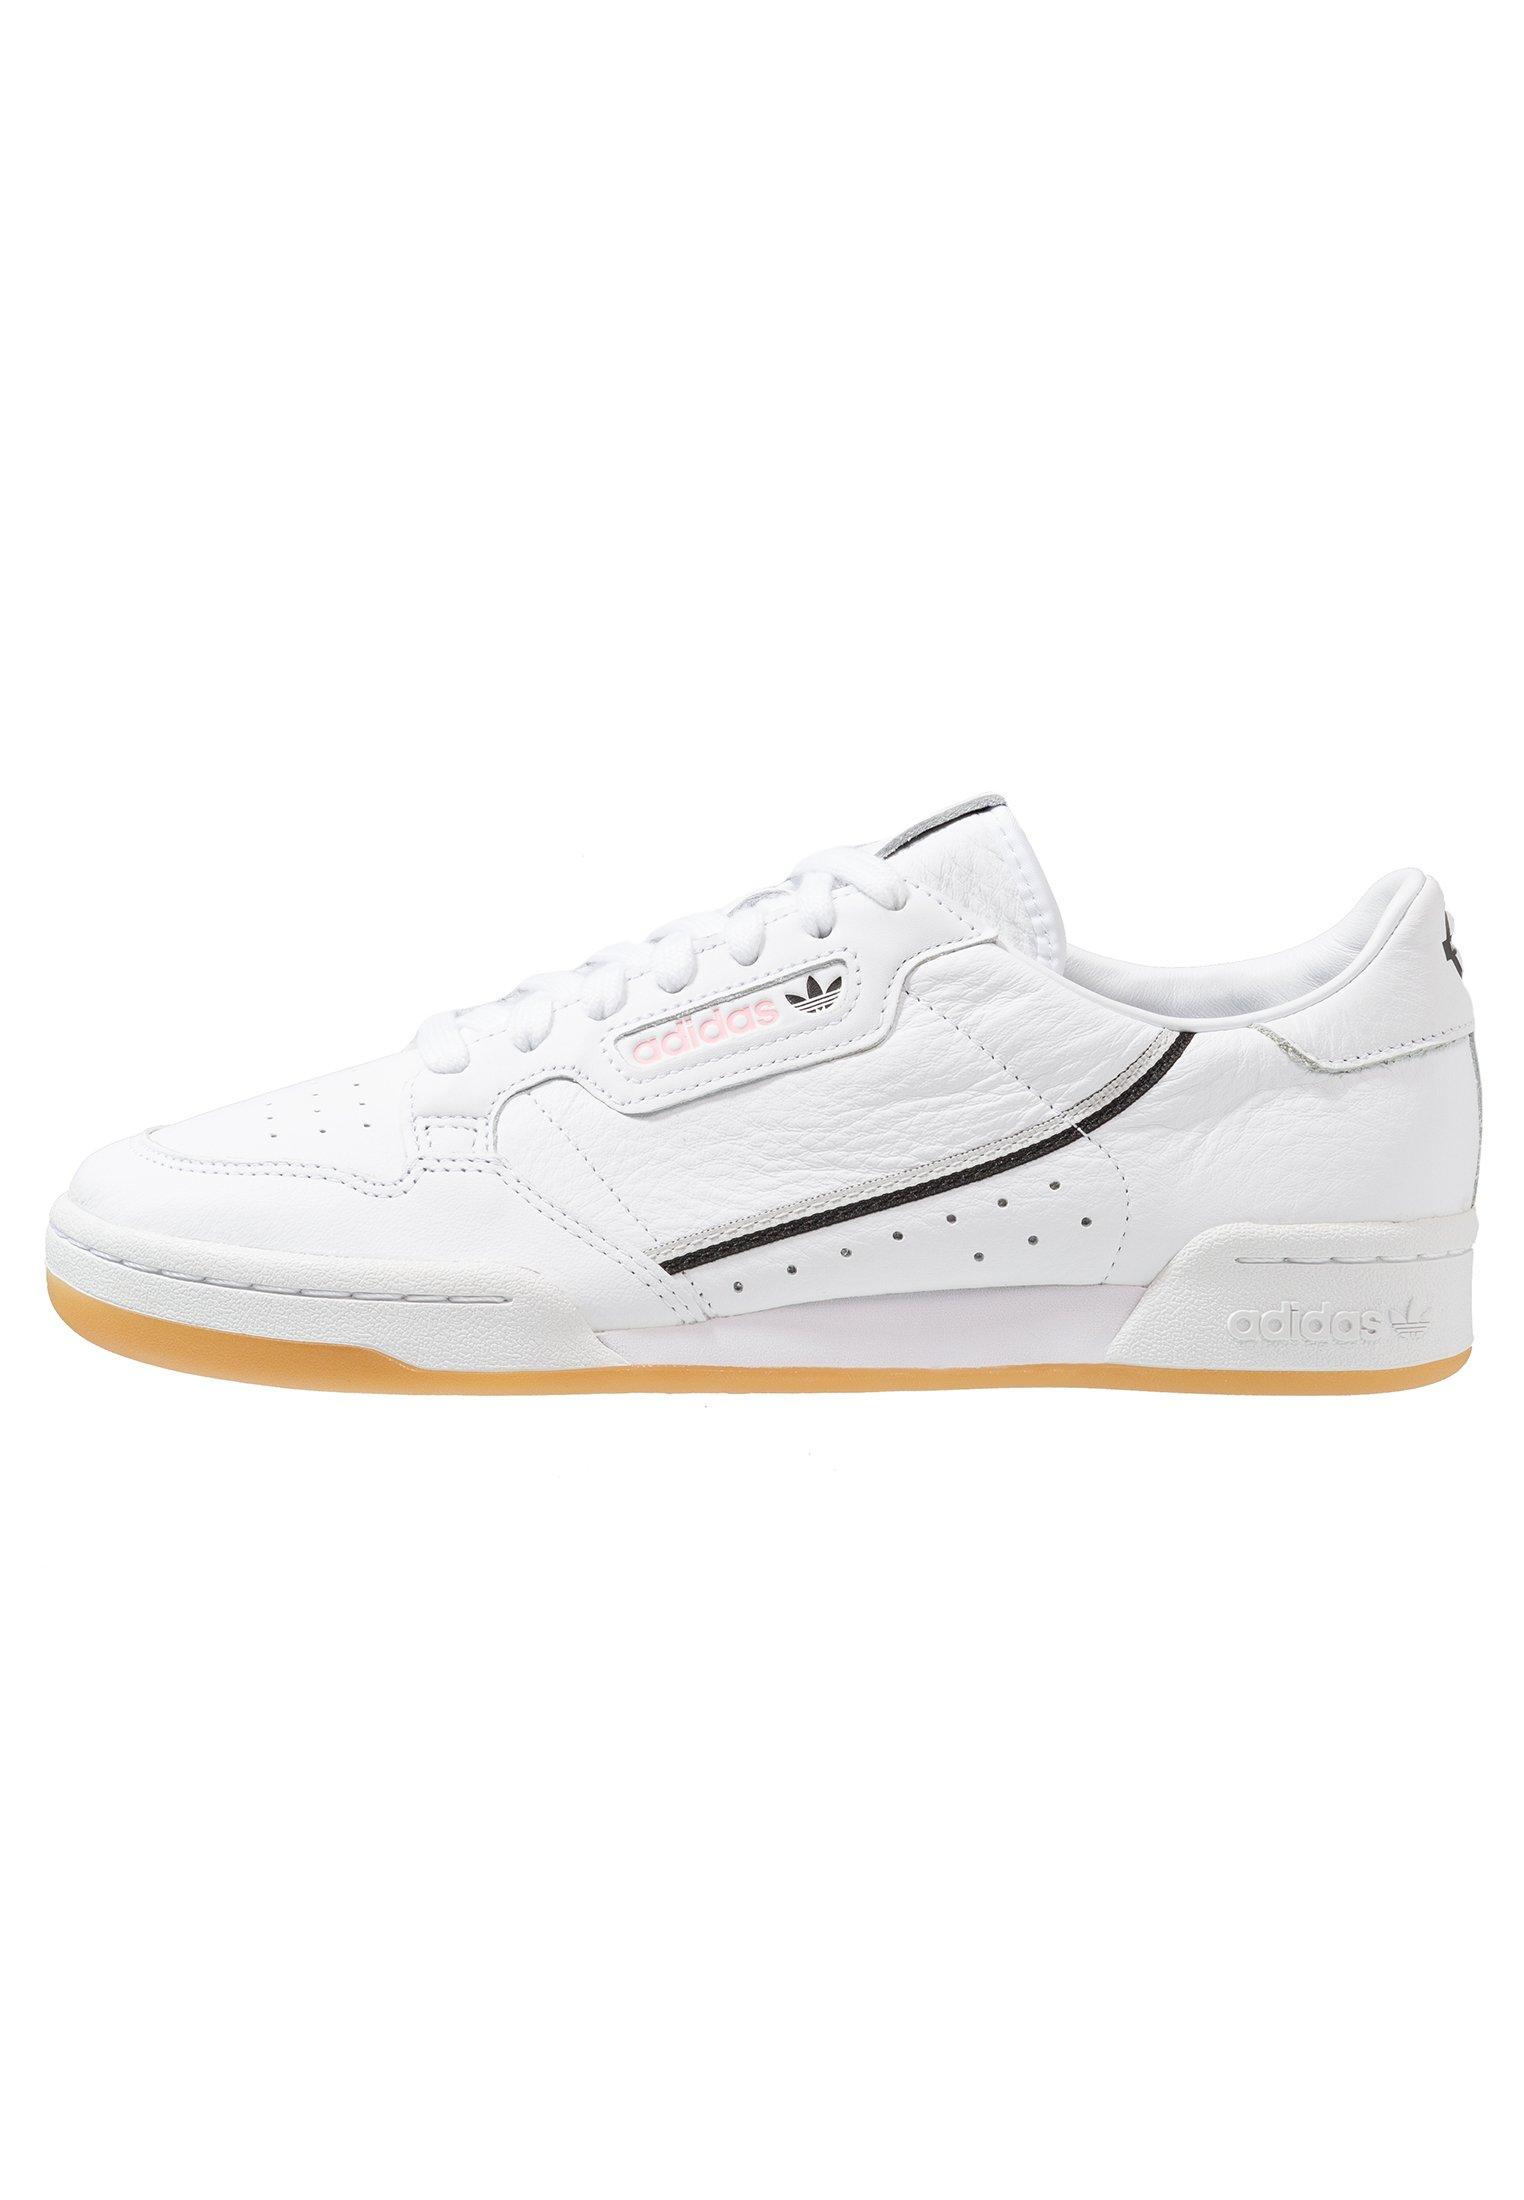 CONTINENTAL 80 Sneakers basse footwear whitegrey onecore black